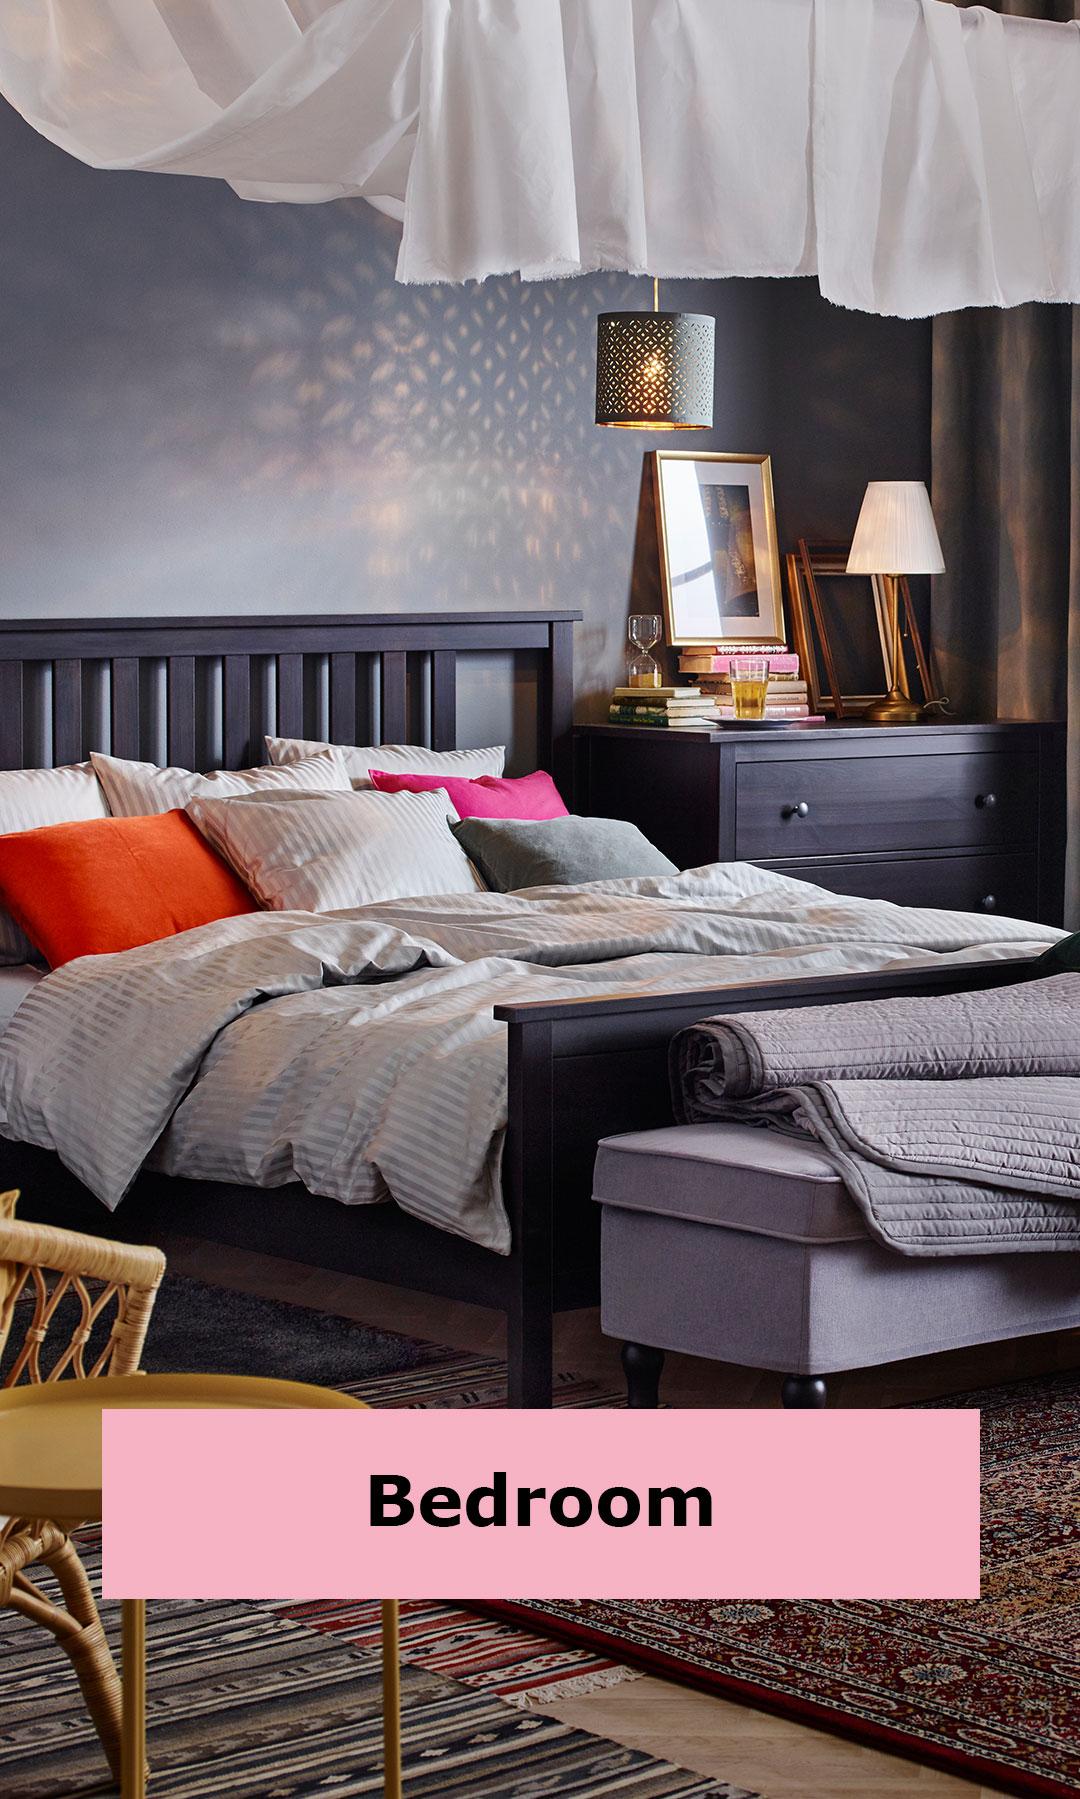 04_Bedroom.jpg